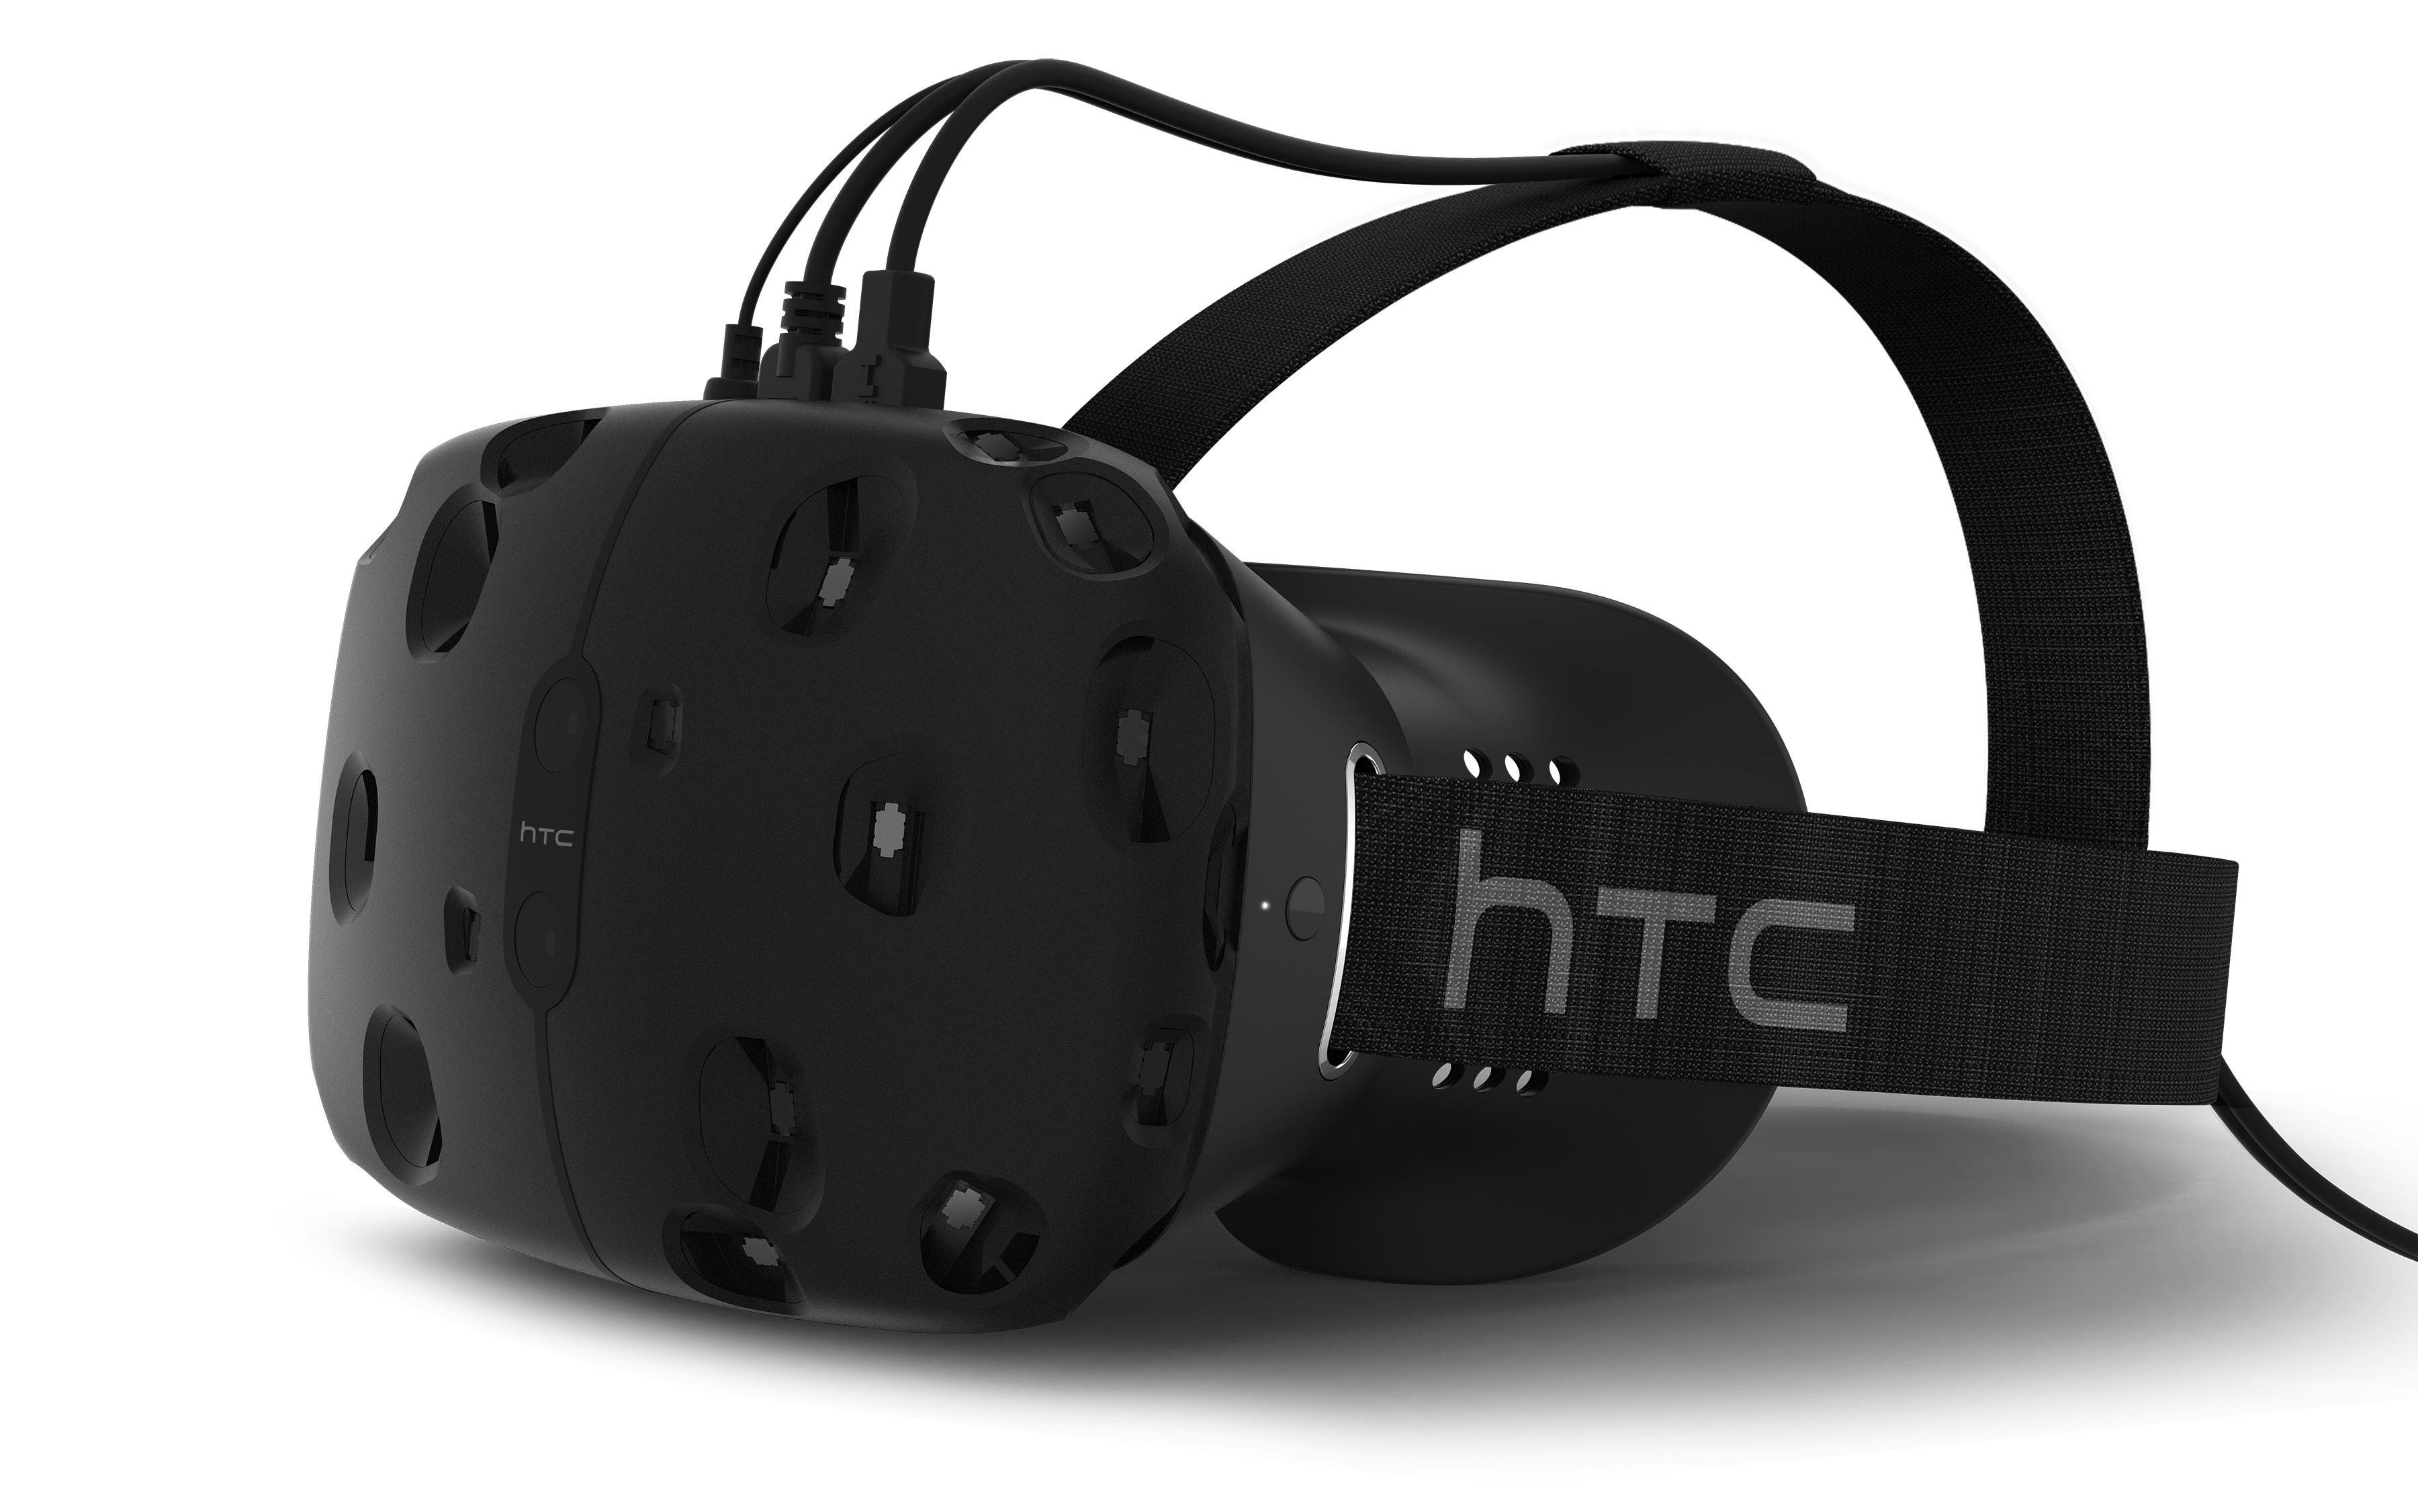 Pilcrow HTC Virtual Reality